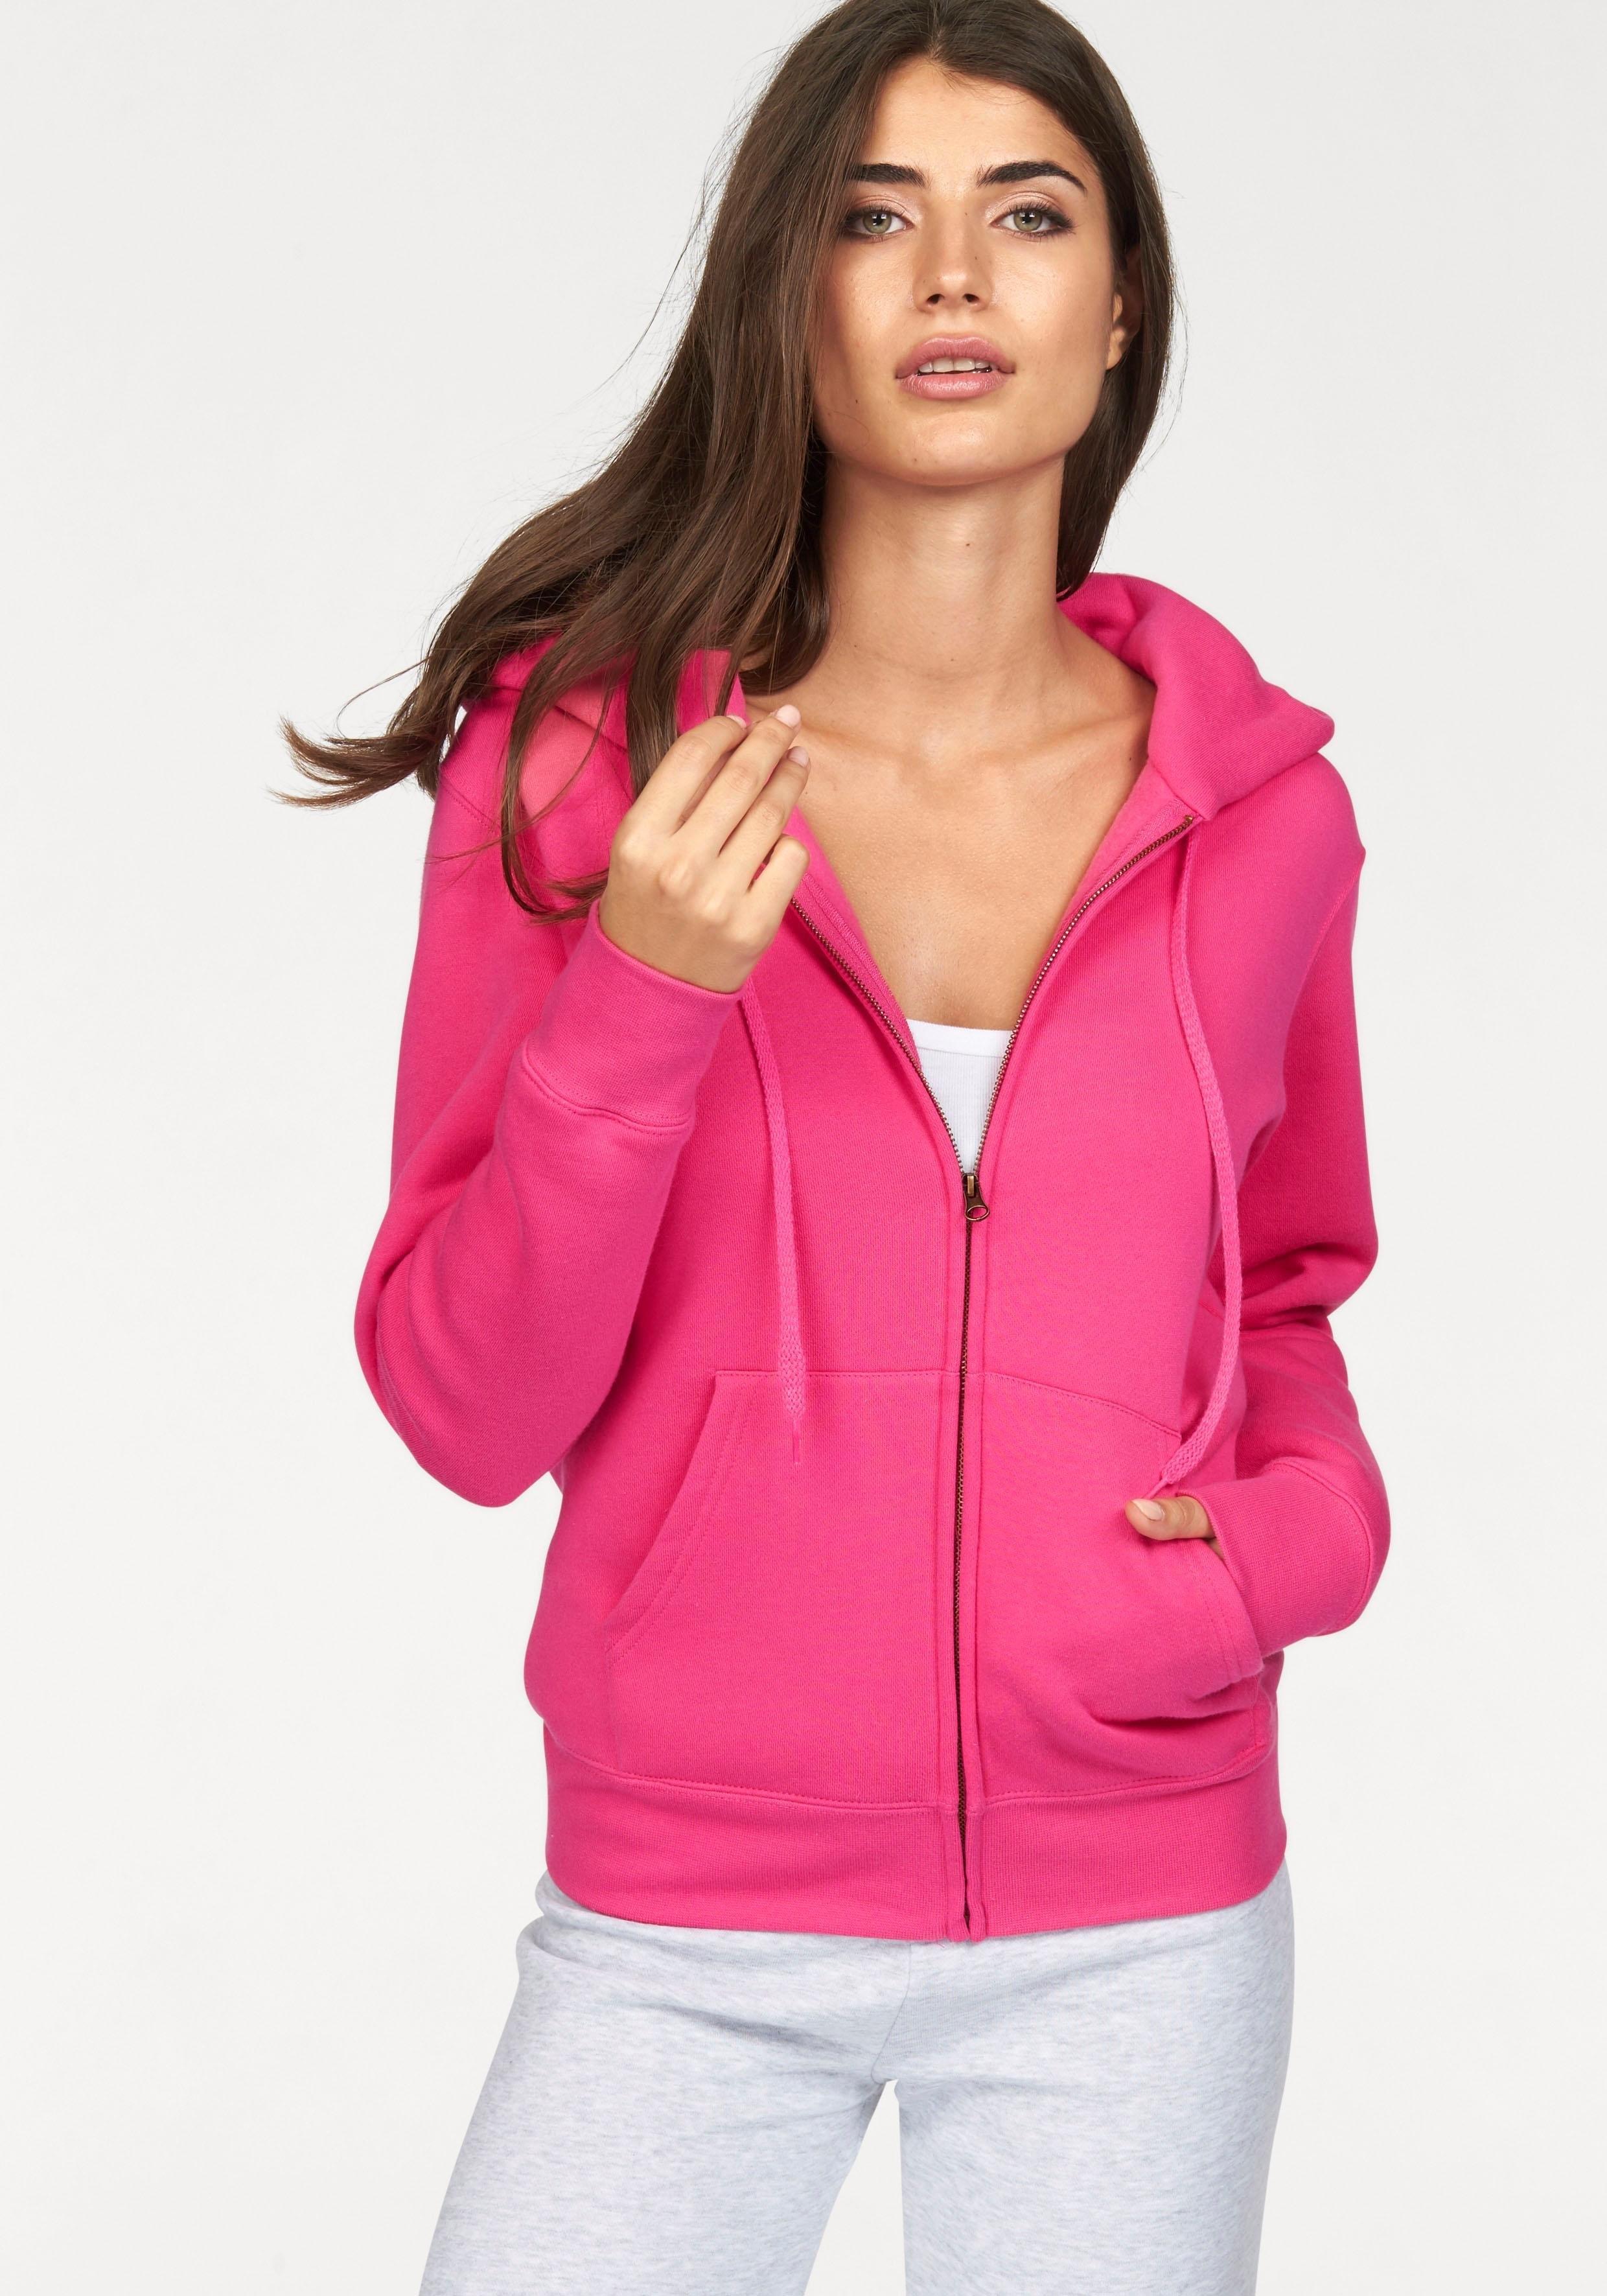 Fruit Of The Loom capuchonsweatshirt »Lady-Fit Premium hooded Sweat Jacket« goedkoop op otto.nl kopen